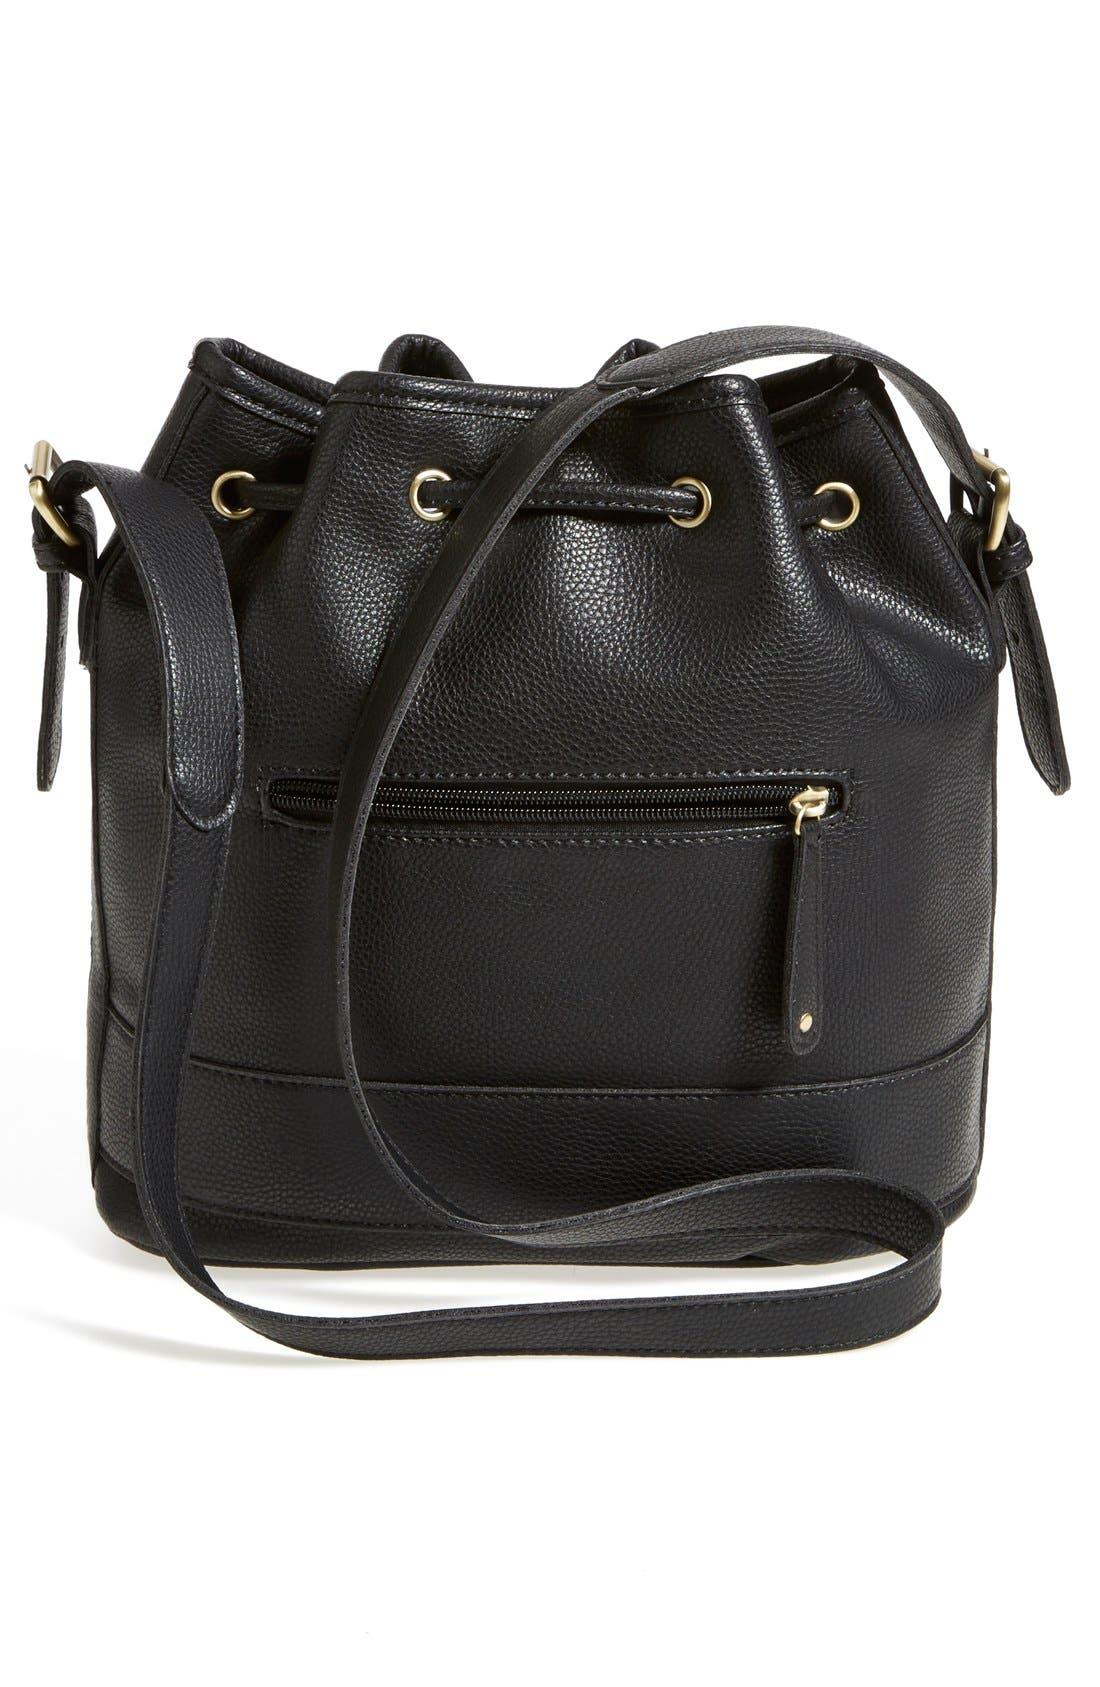 STREET LEVEL, 'Concha' Faux Leather Bucket Bag, Alternate thumbnail 4, color, 001